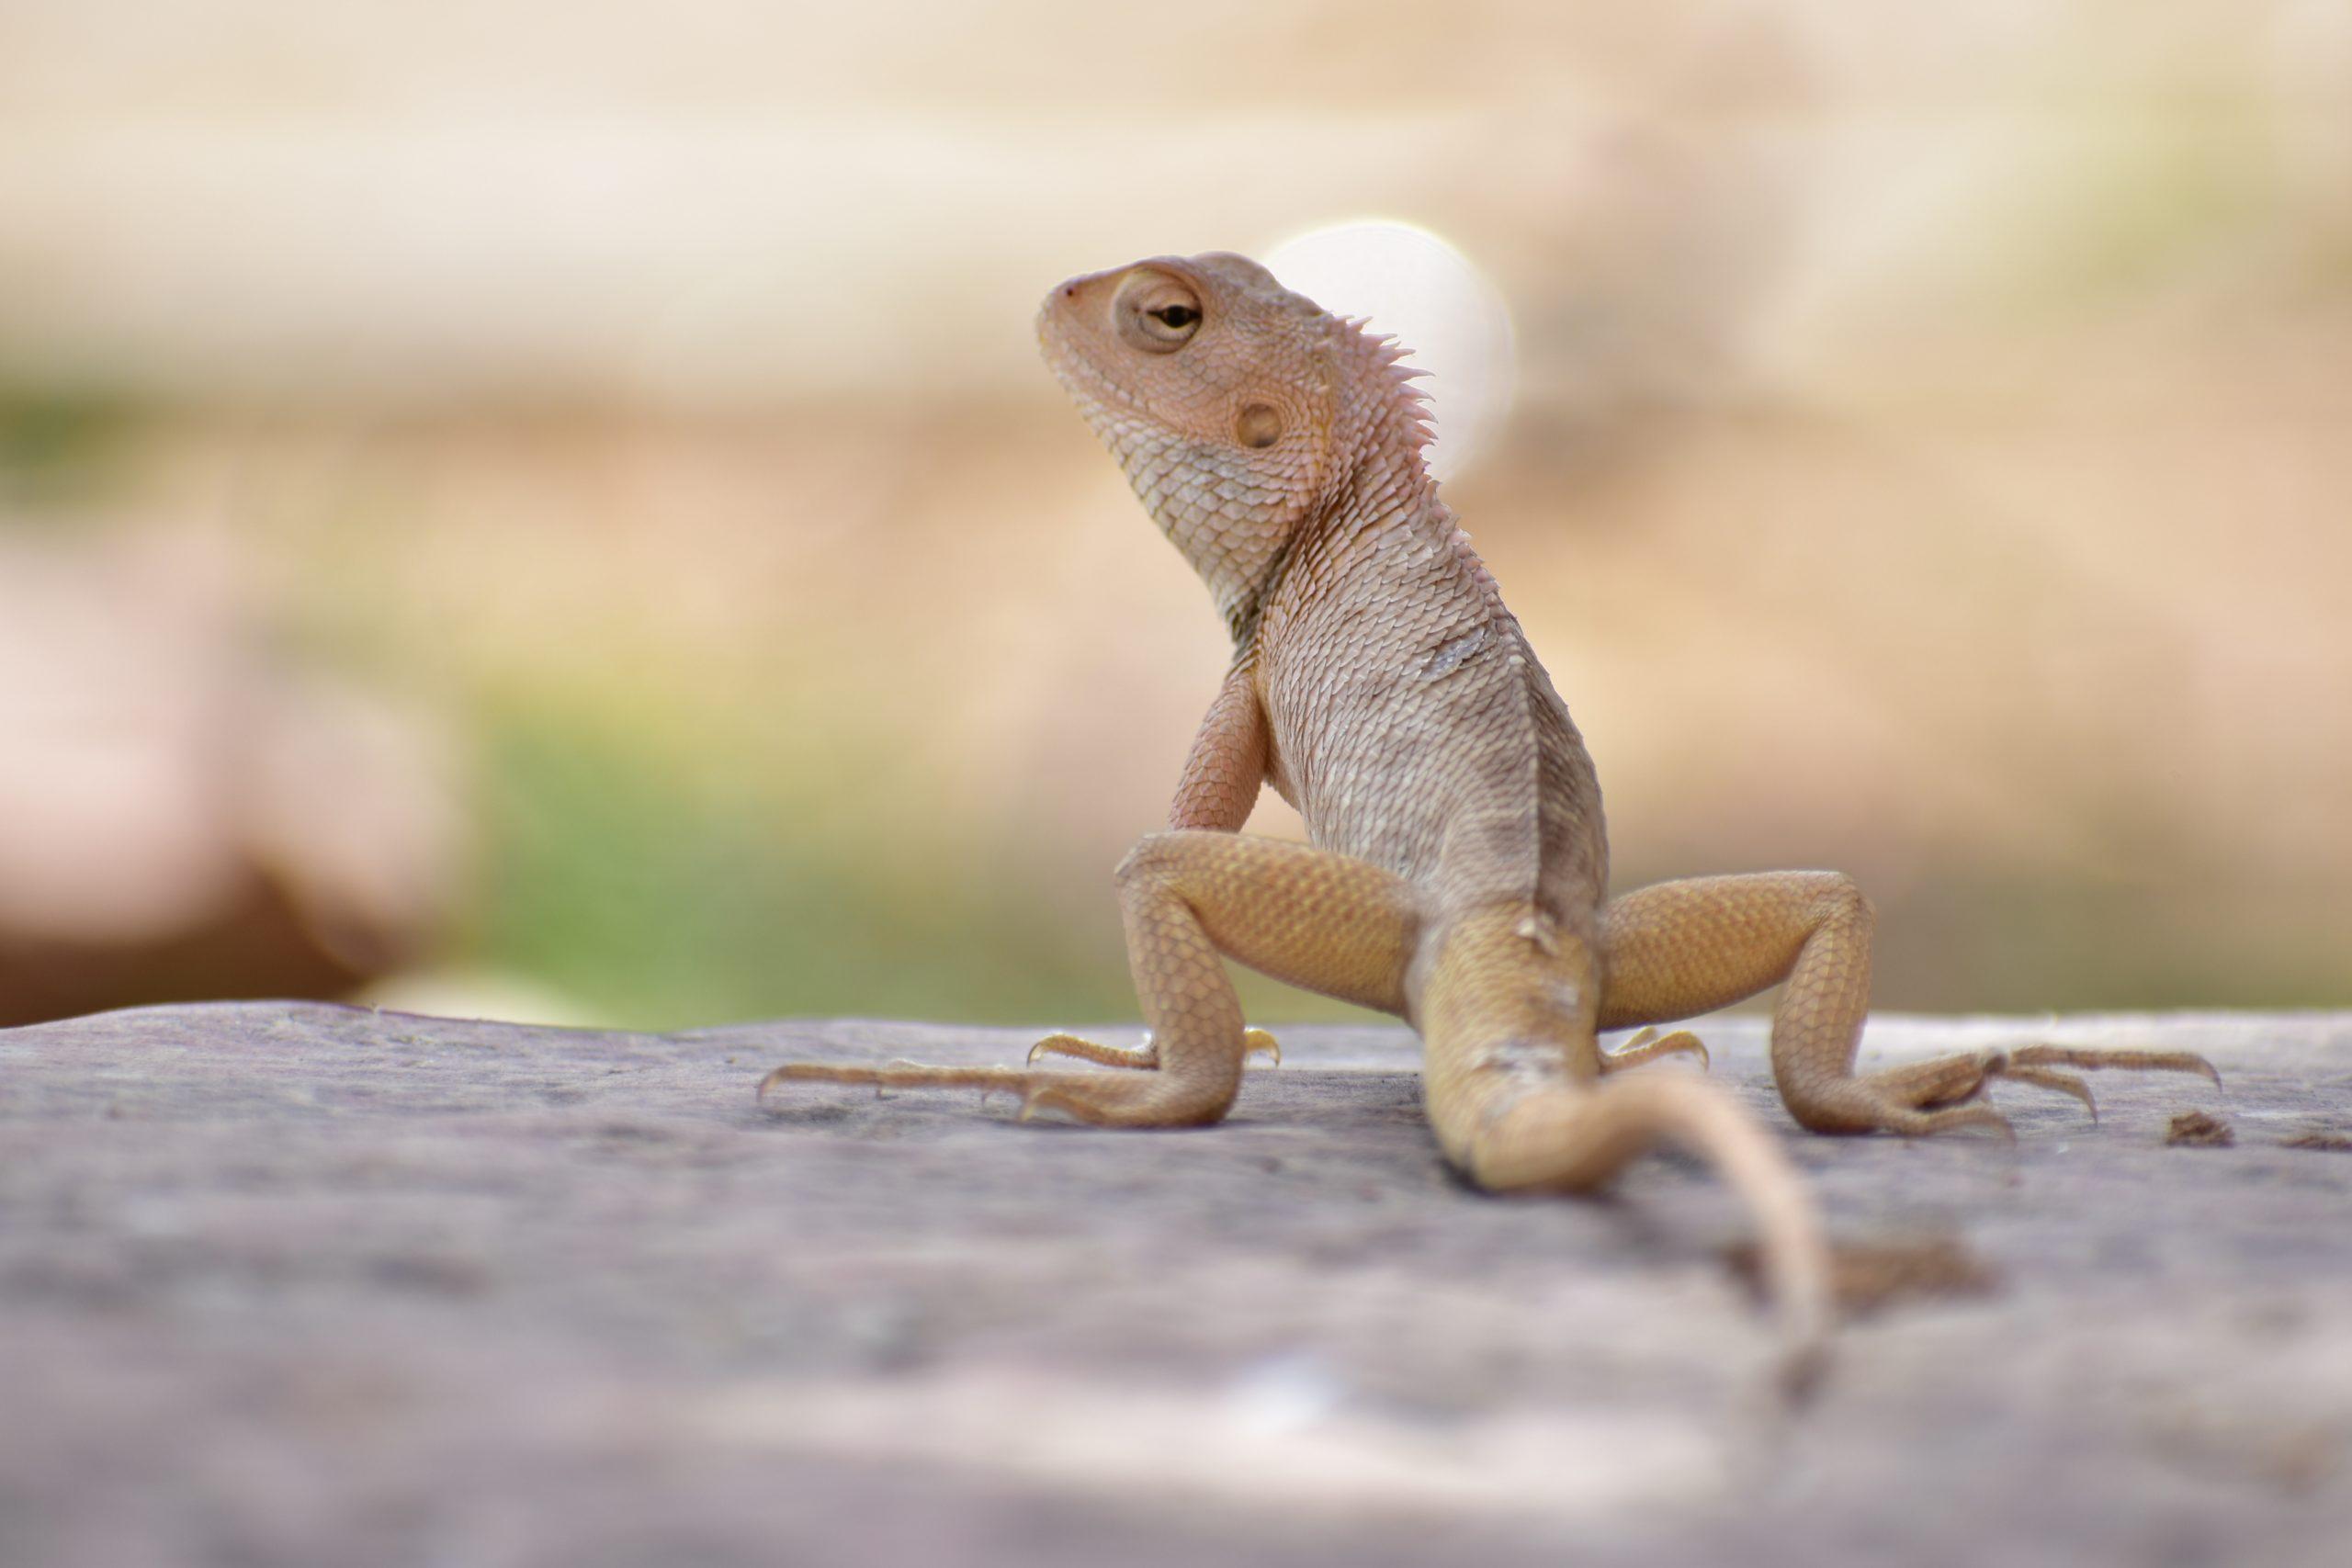 A chameleon on a rock surface